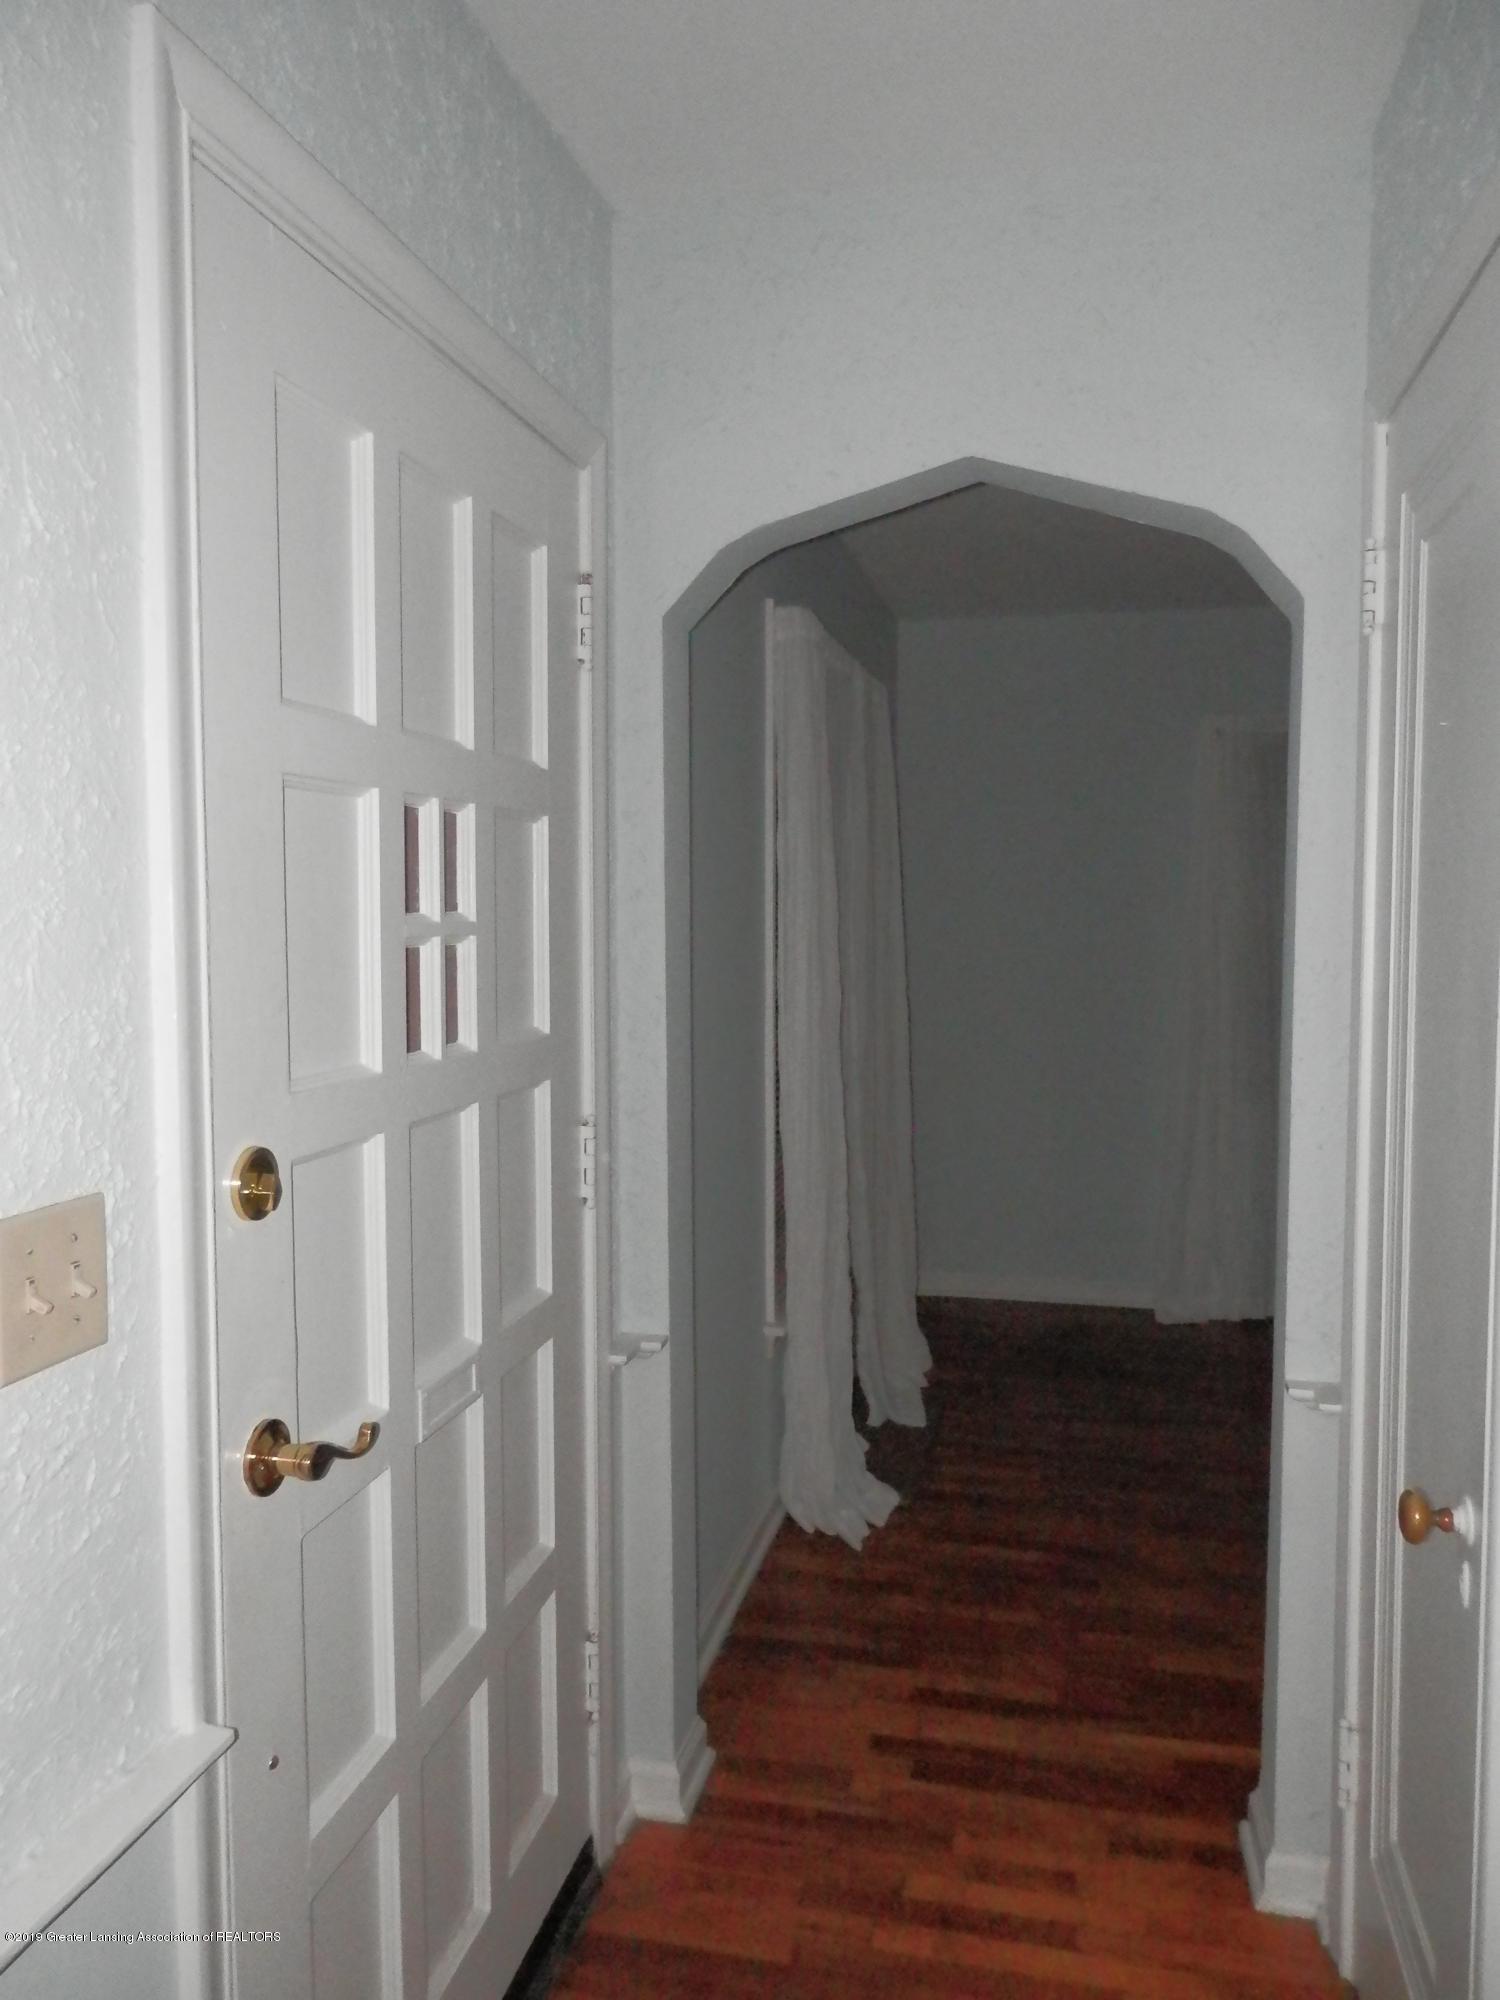 352 Collingwood Dr - Inside front door - 3